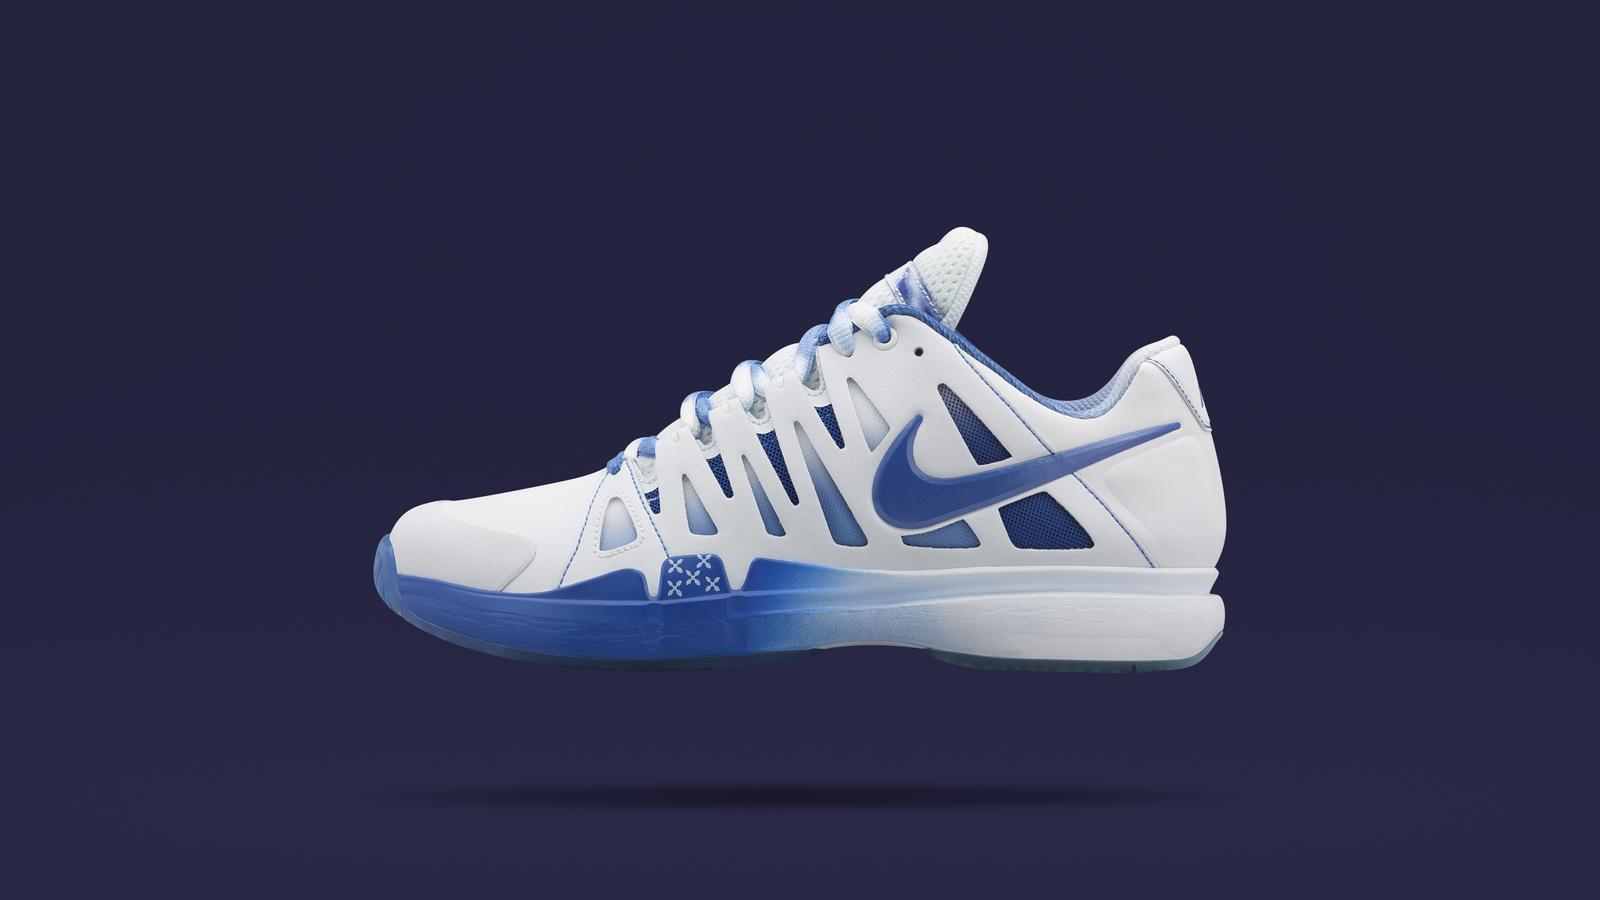 Nikecourt zoom vapor 9 x colette. 1jpg hd 1600